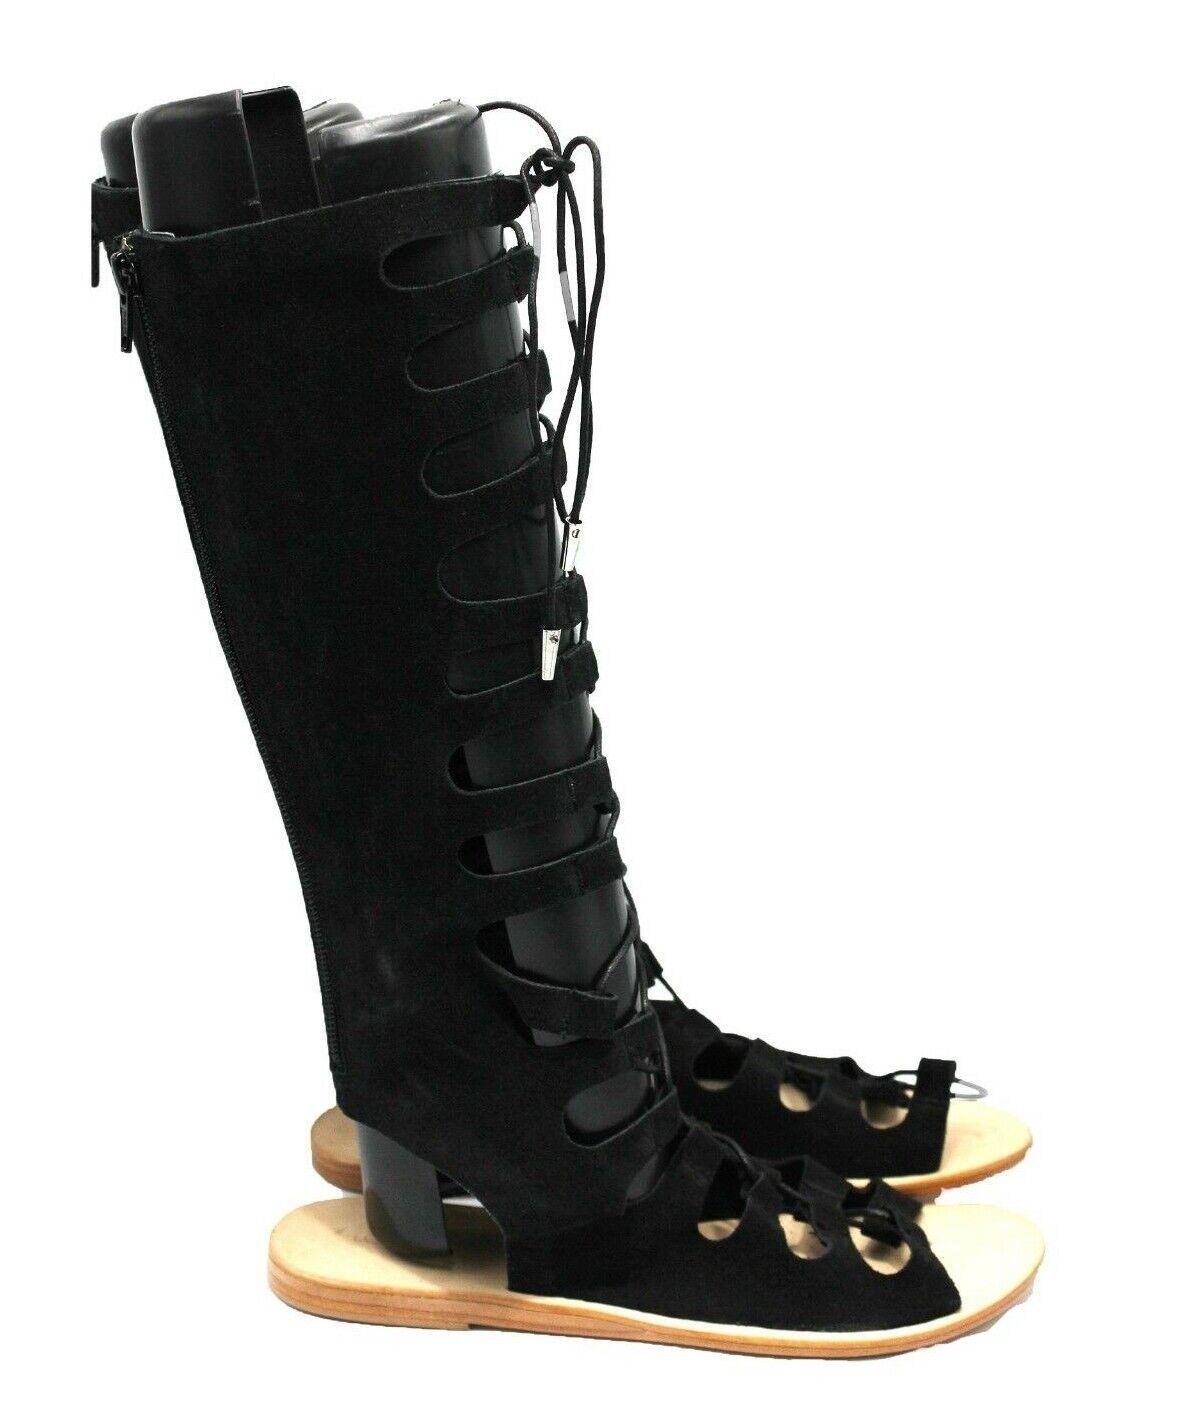 Instamhommest Arya Femme Gladiator Lace Up Sandal en noir-Taille 8.5 - Neuf Authentique